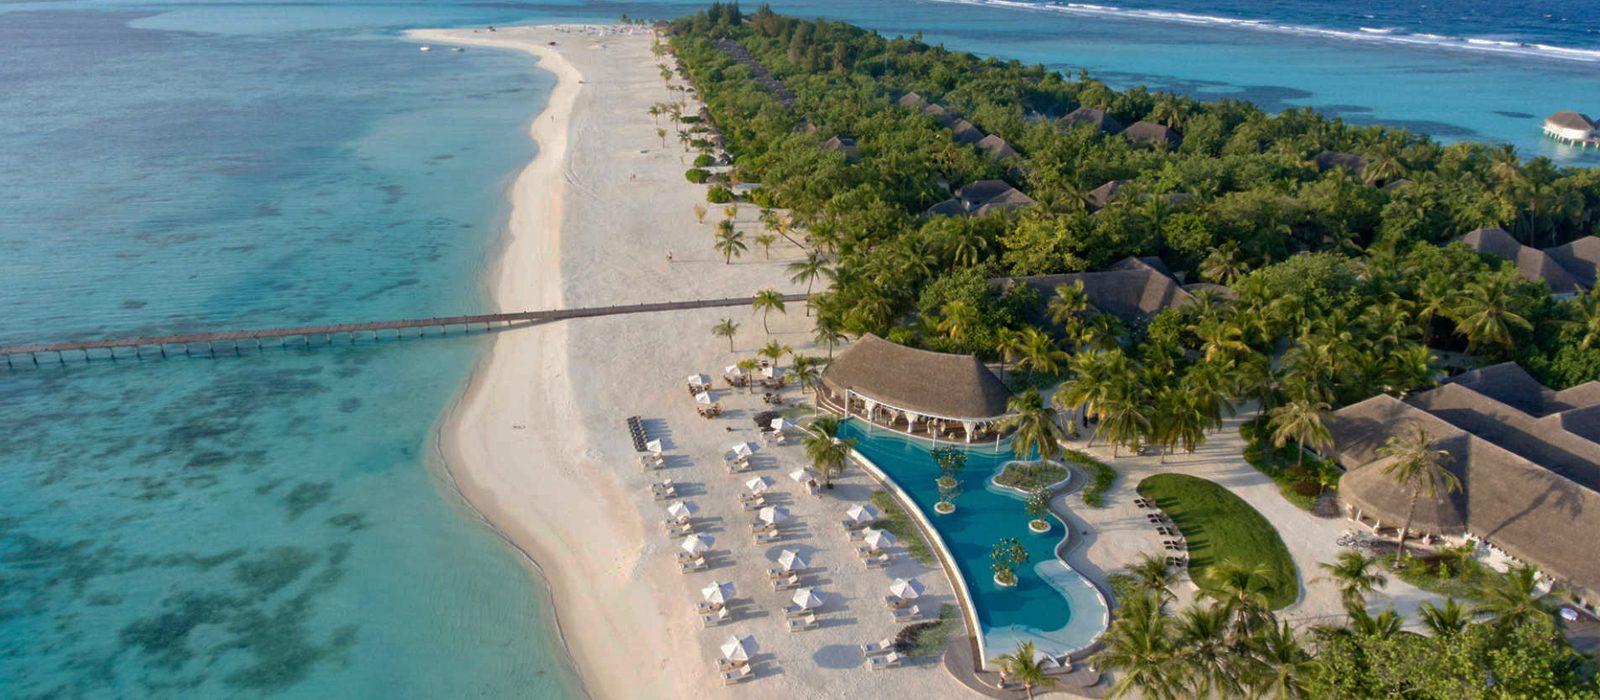 Luxury Maldives Holiday Packages Kanuhura Maldives Header